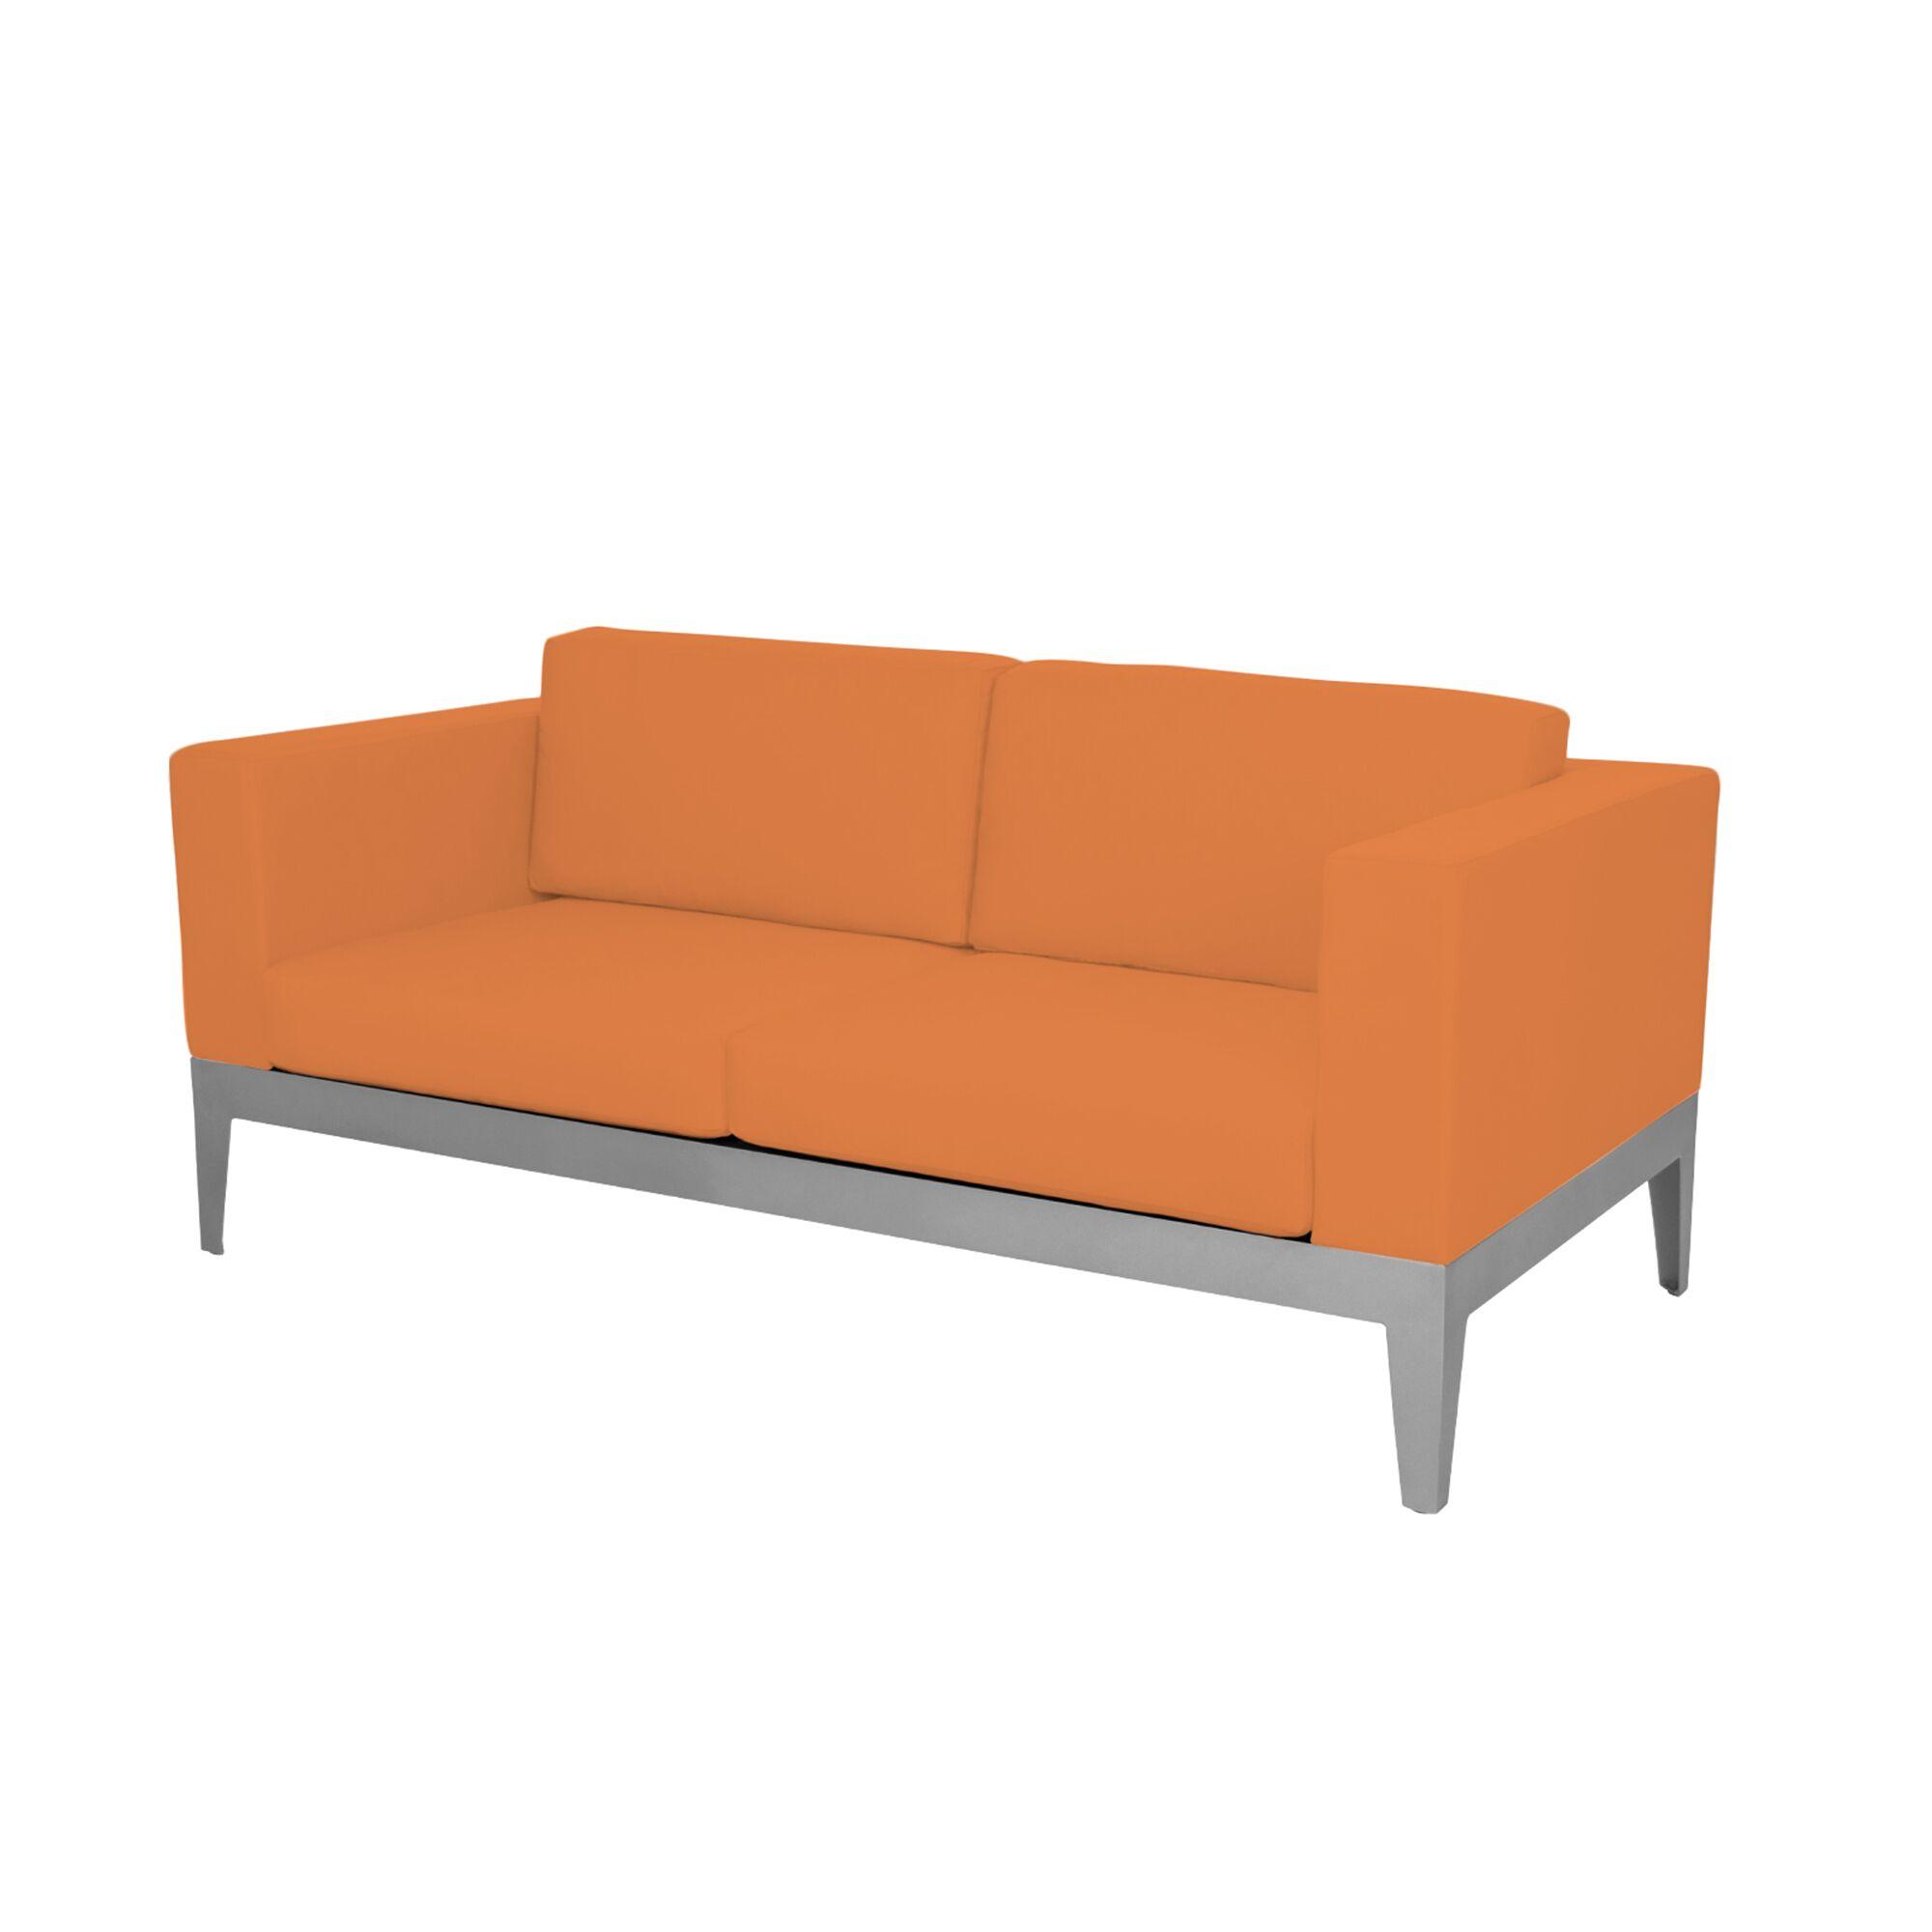 Angelina Loveseat with Cushion Fabric: Sunbrella Tangerine